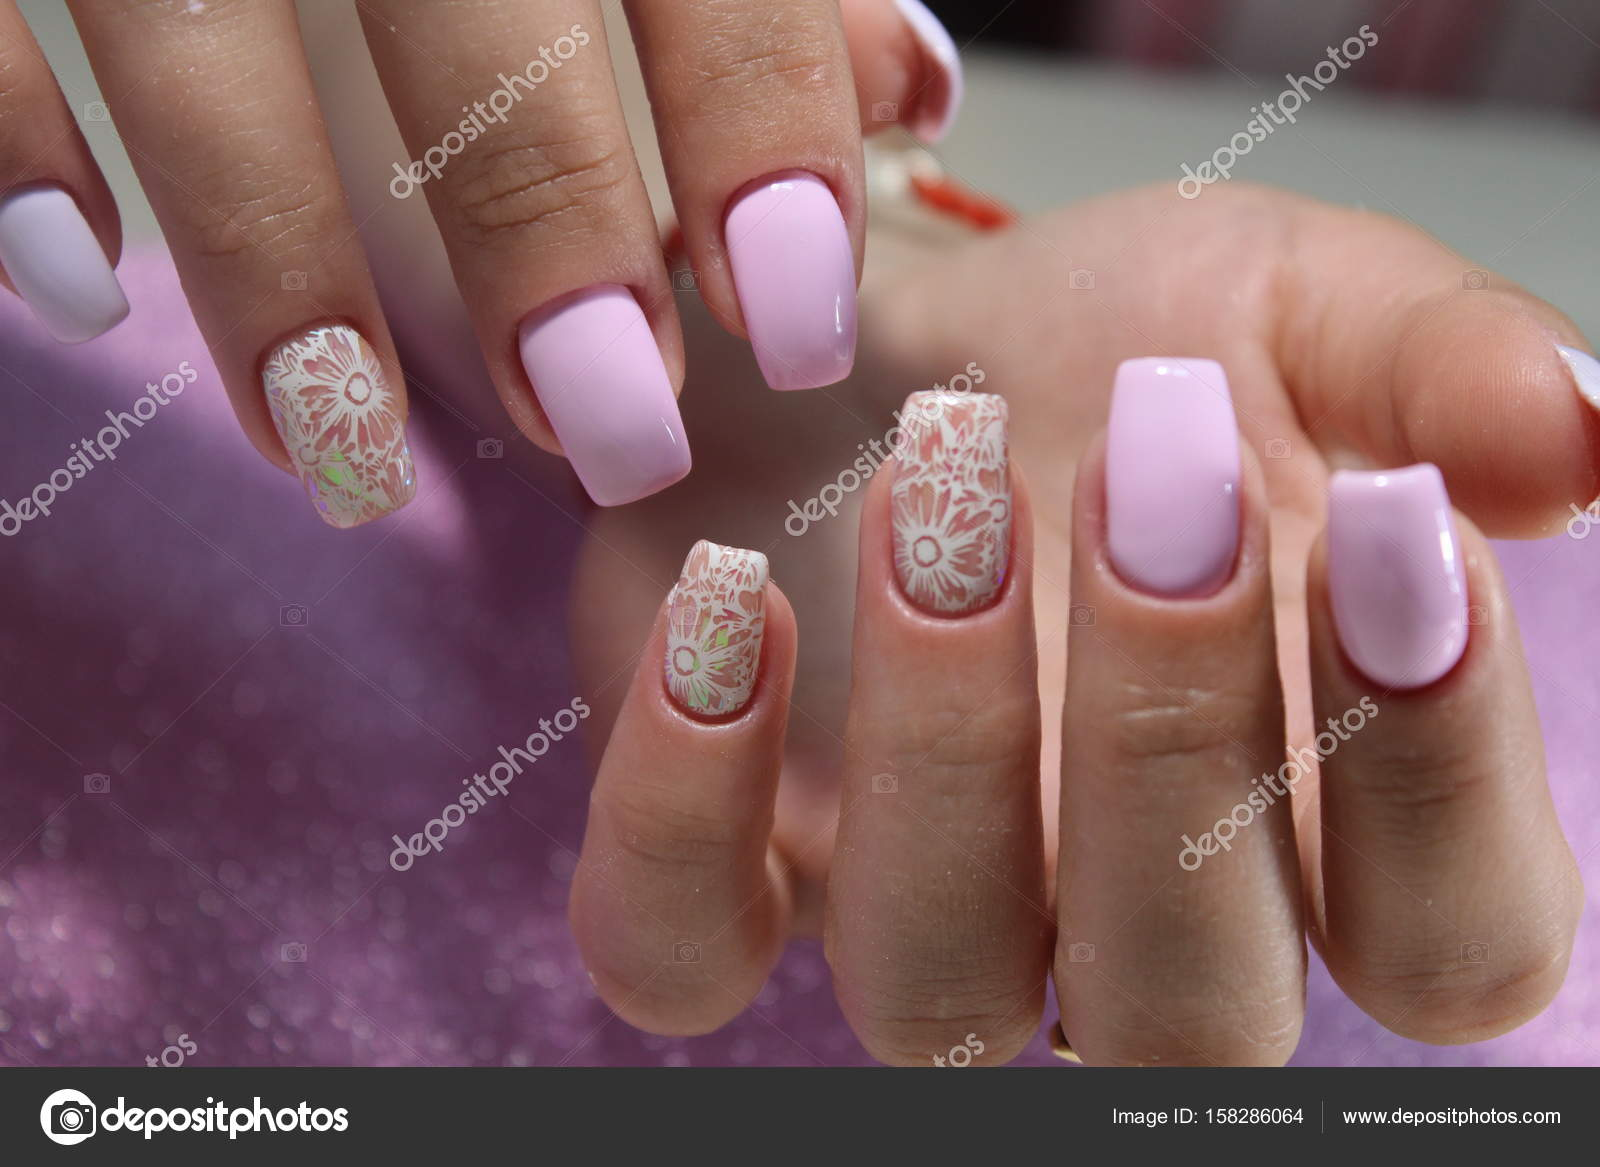 Manicure diseo uas gel Foto de stock SmirMaxStock 158286064